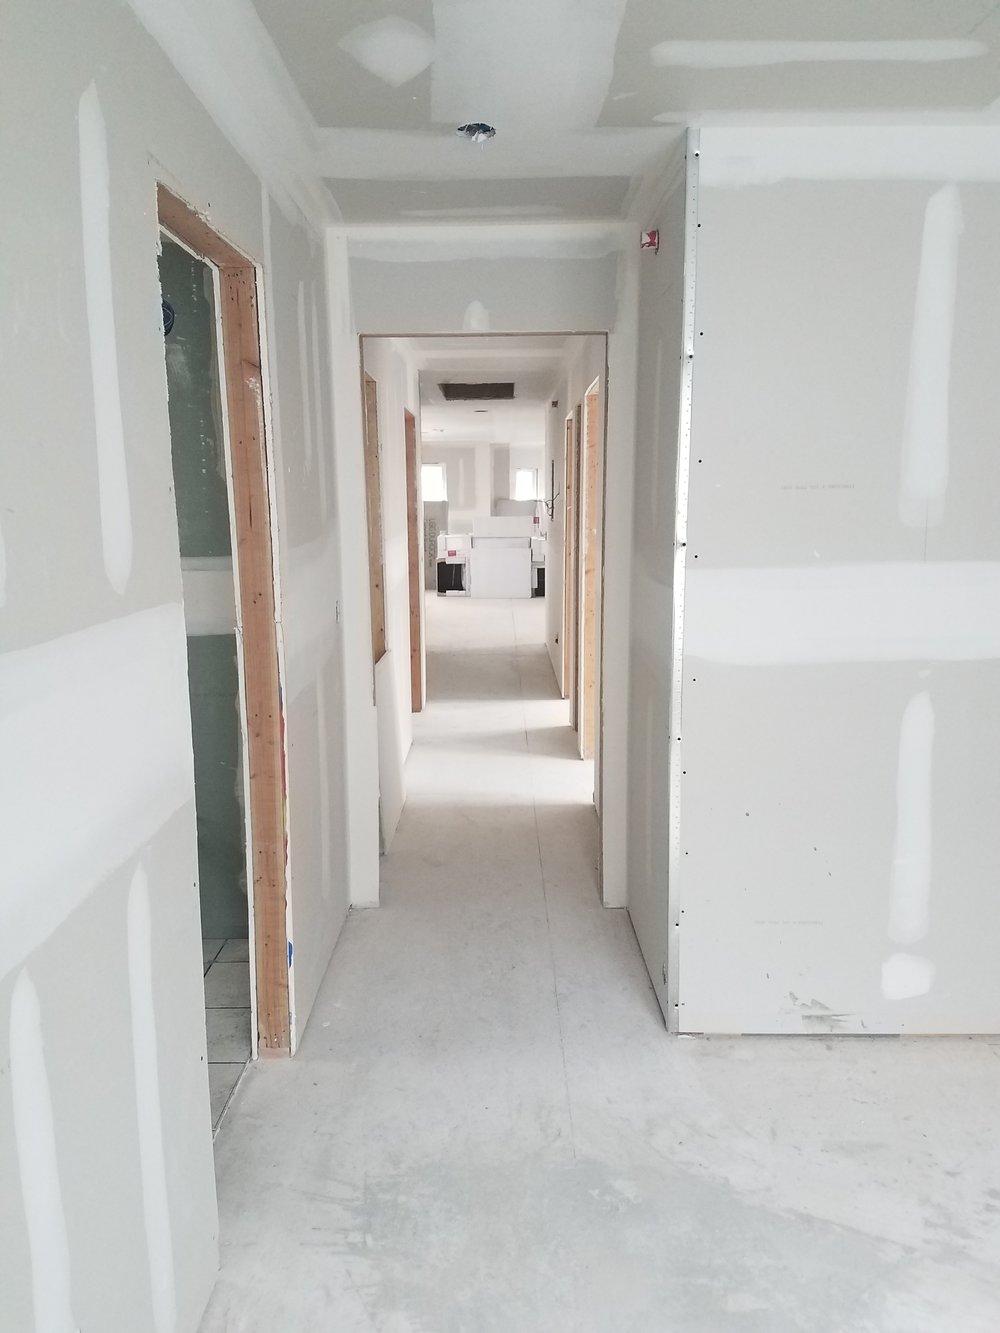 Master Bedroom and Hallway Drywall